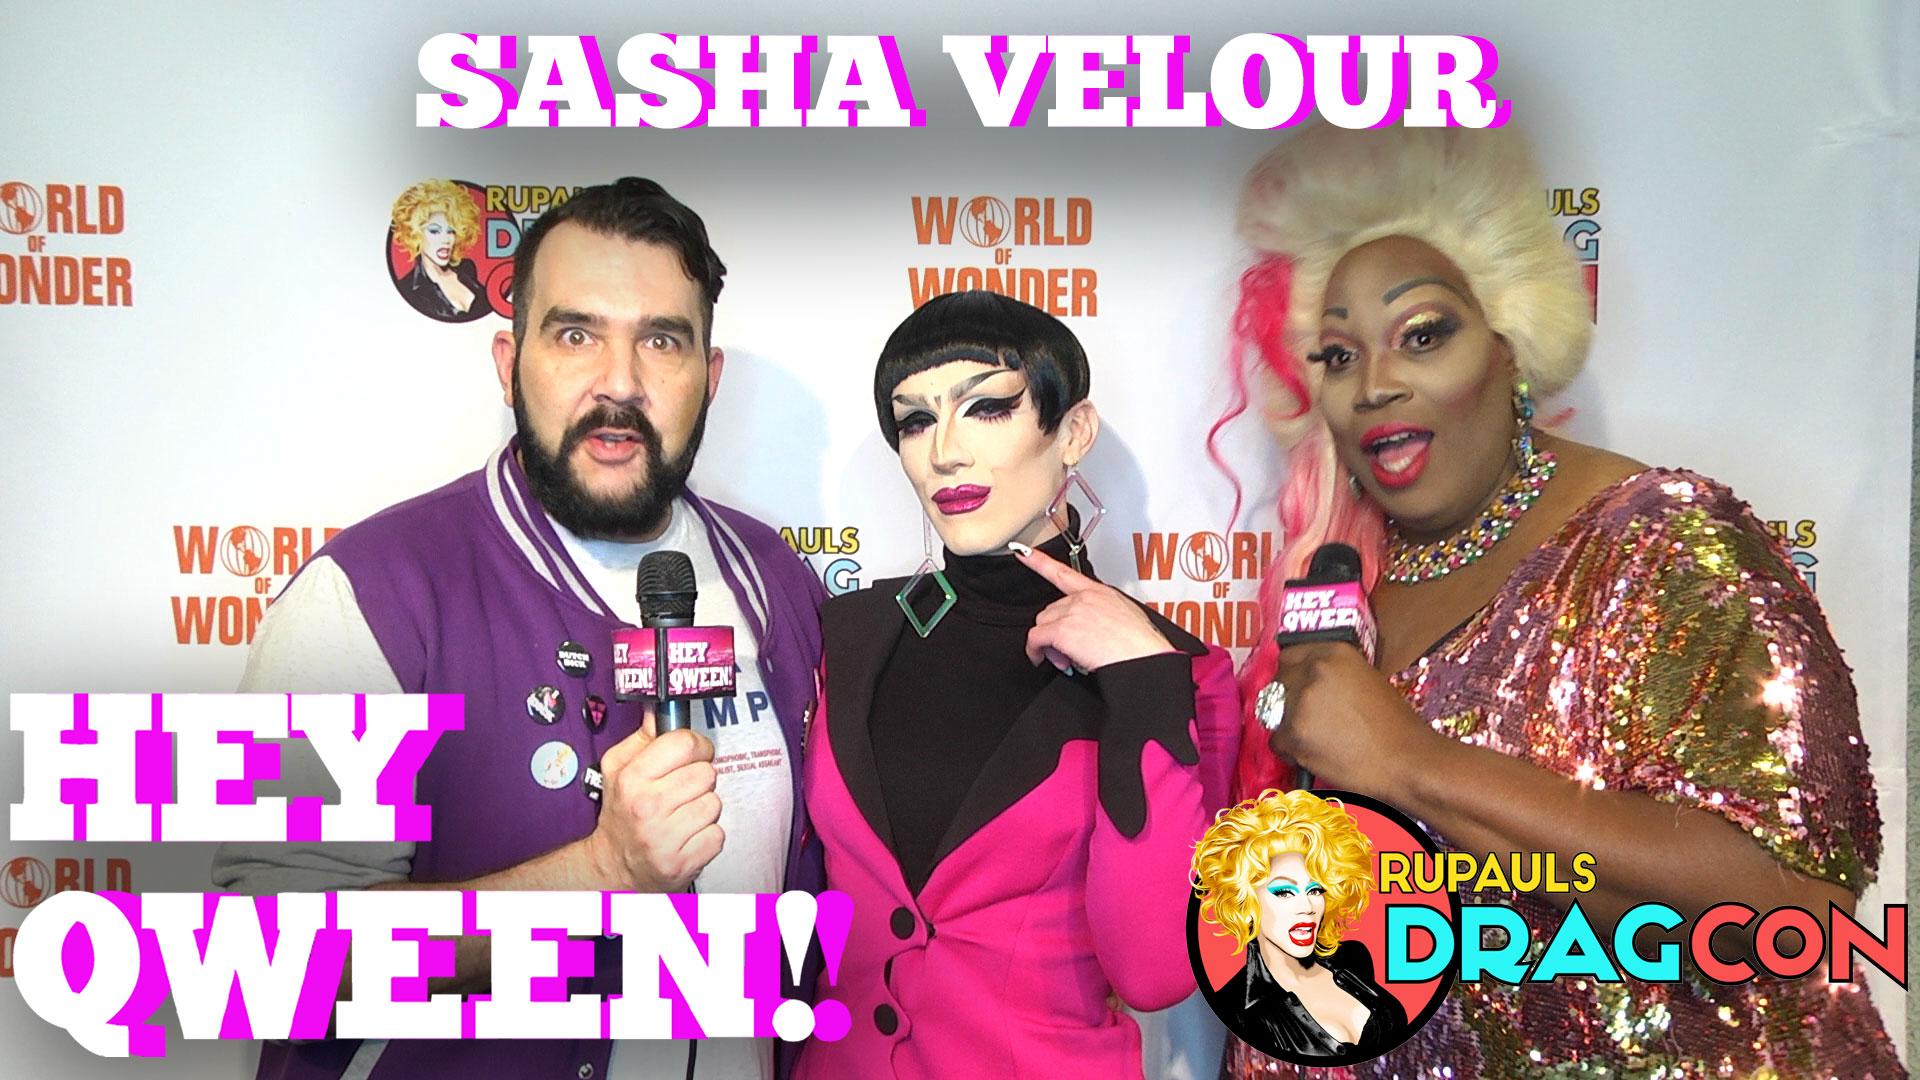 Sasha Velour on Hey Qween LIVE! At DragCon2017